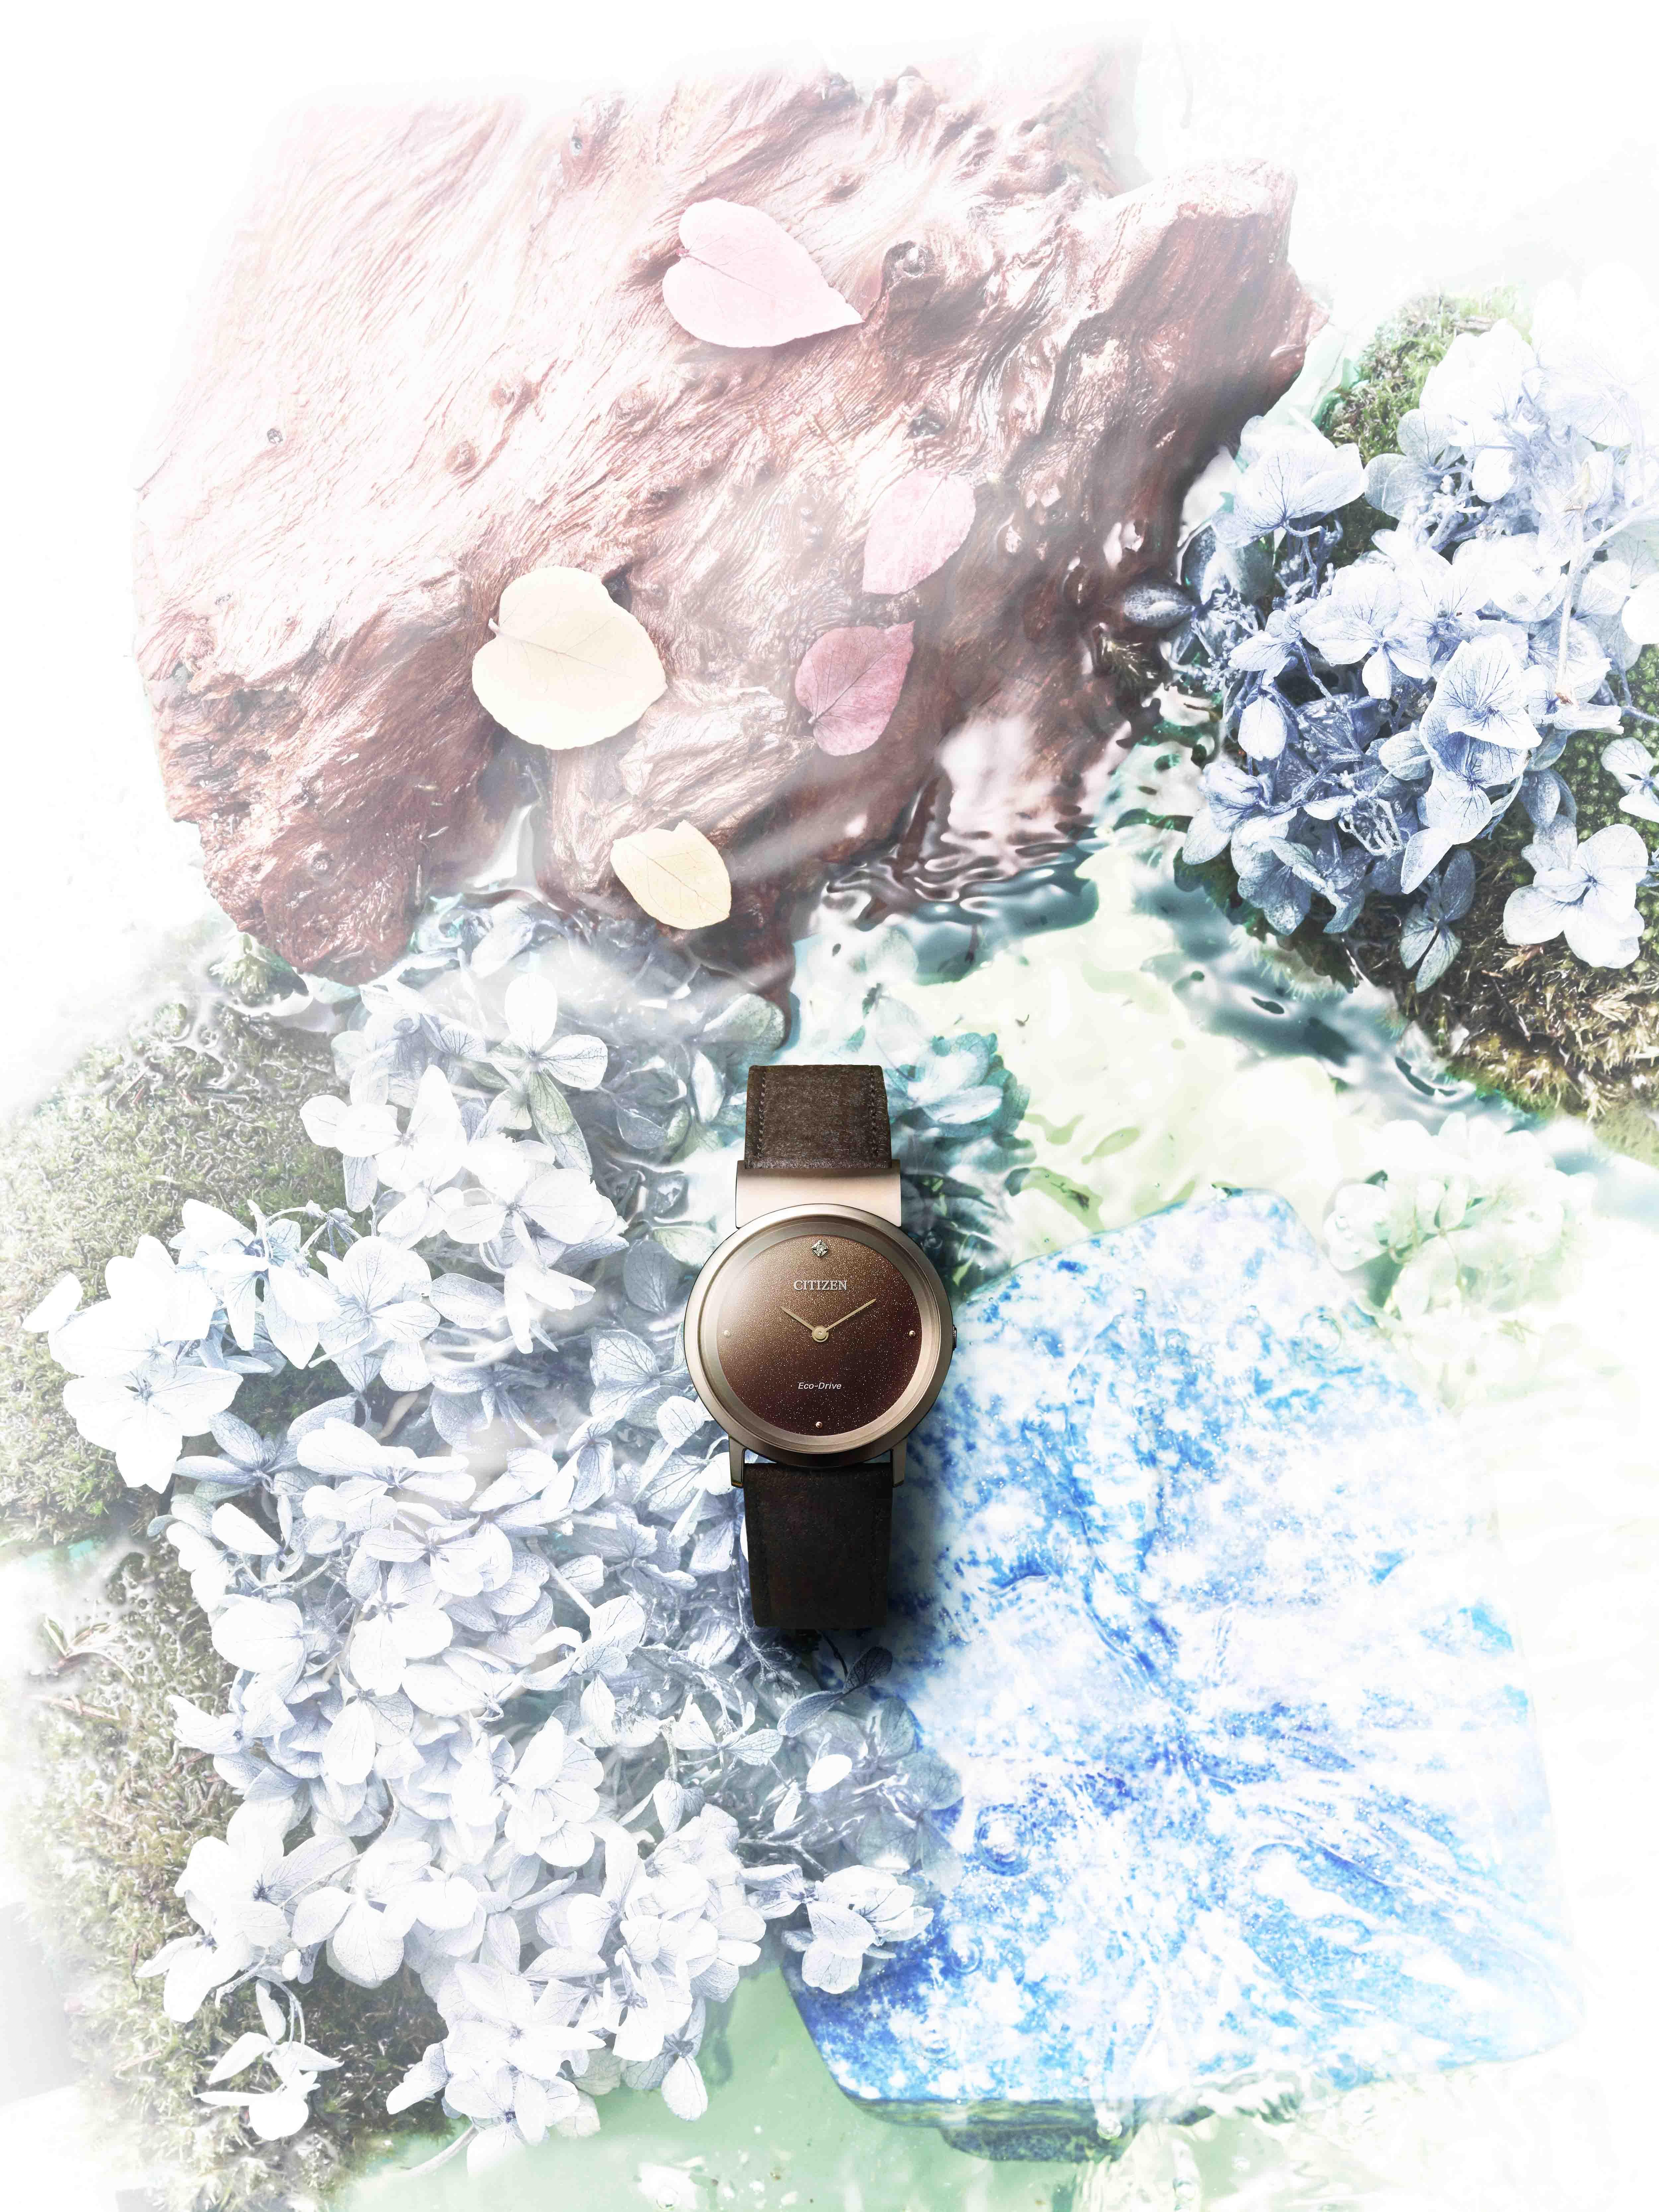 đồng hồ Citizen Earth